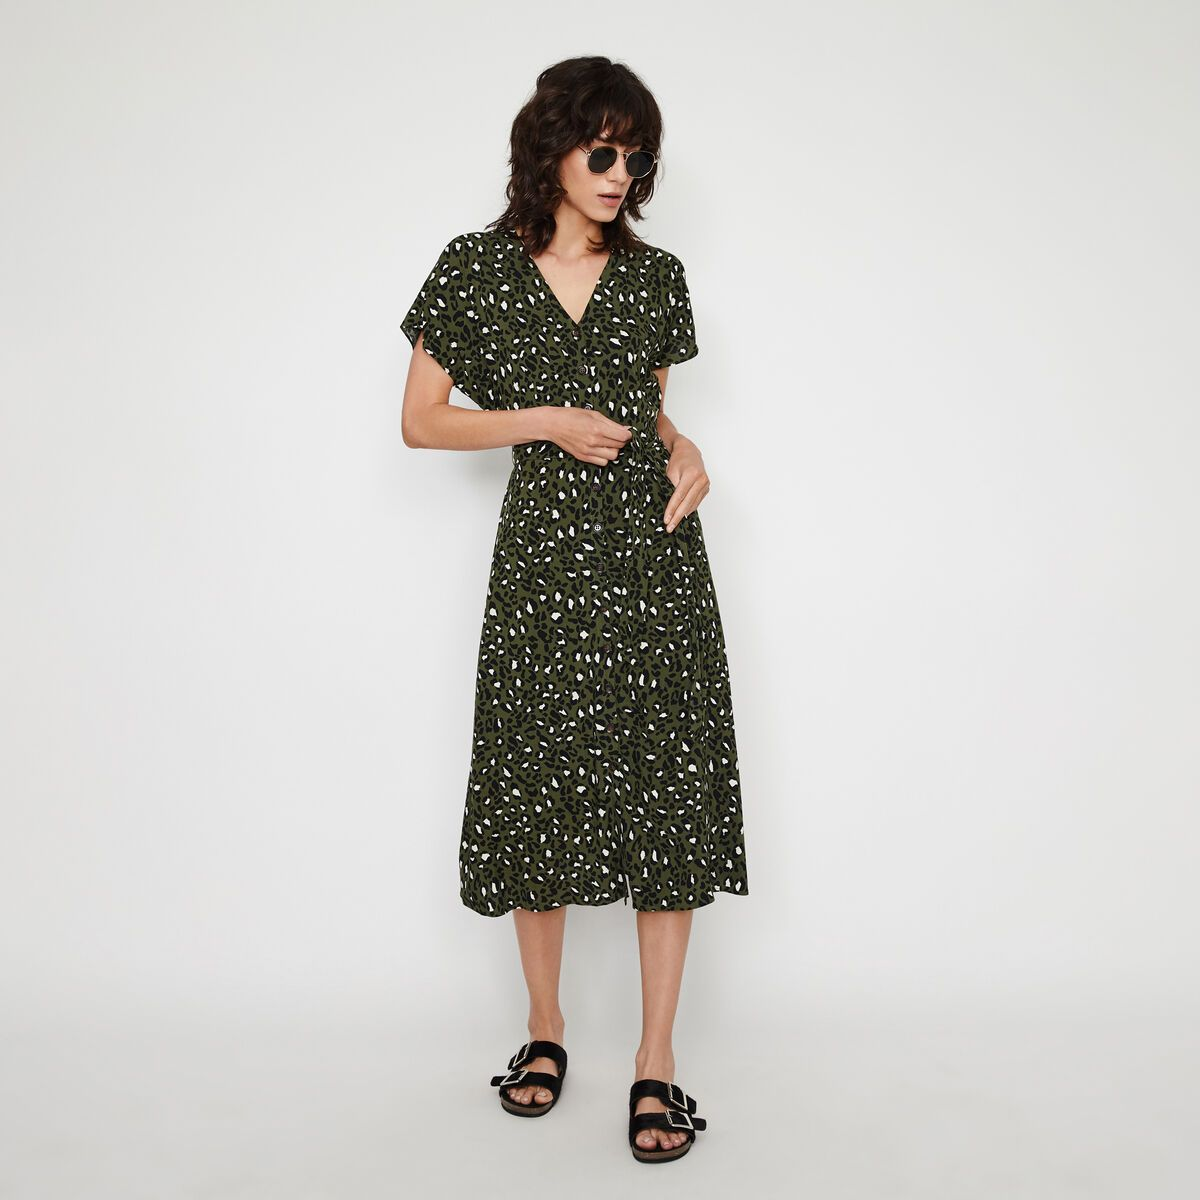 Warehouse Leopard Button Midi Dress Green Print 1 Floral Print Midi Dress Leopard Print Dress Dresses